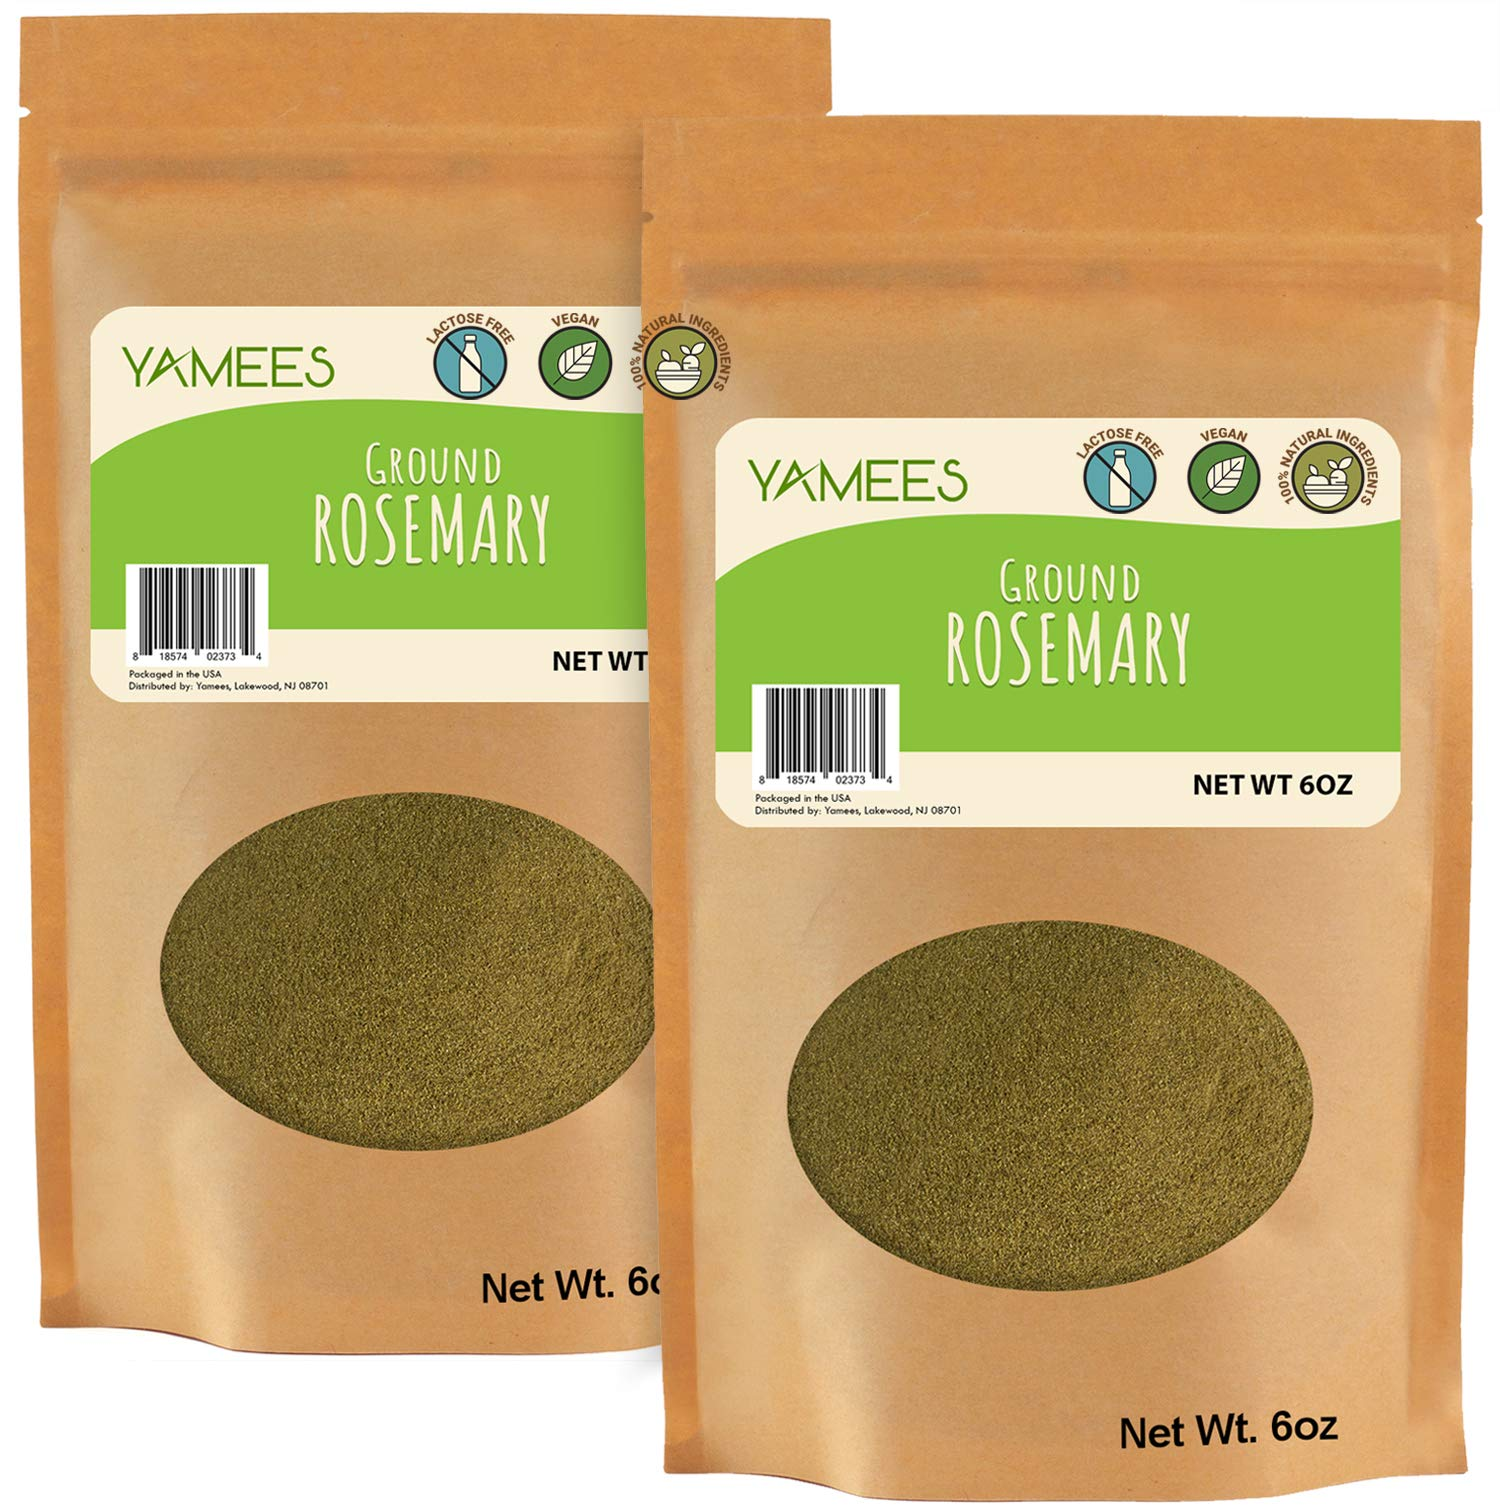 Rosemary Powder - 12 Oz (6 Oz Each) – Ground Rosemary – Dried Rosemary Powder – Powder Rosemary – Rosemary Ground - Bulk Spices